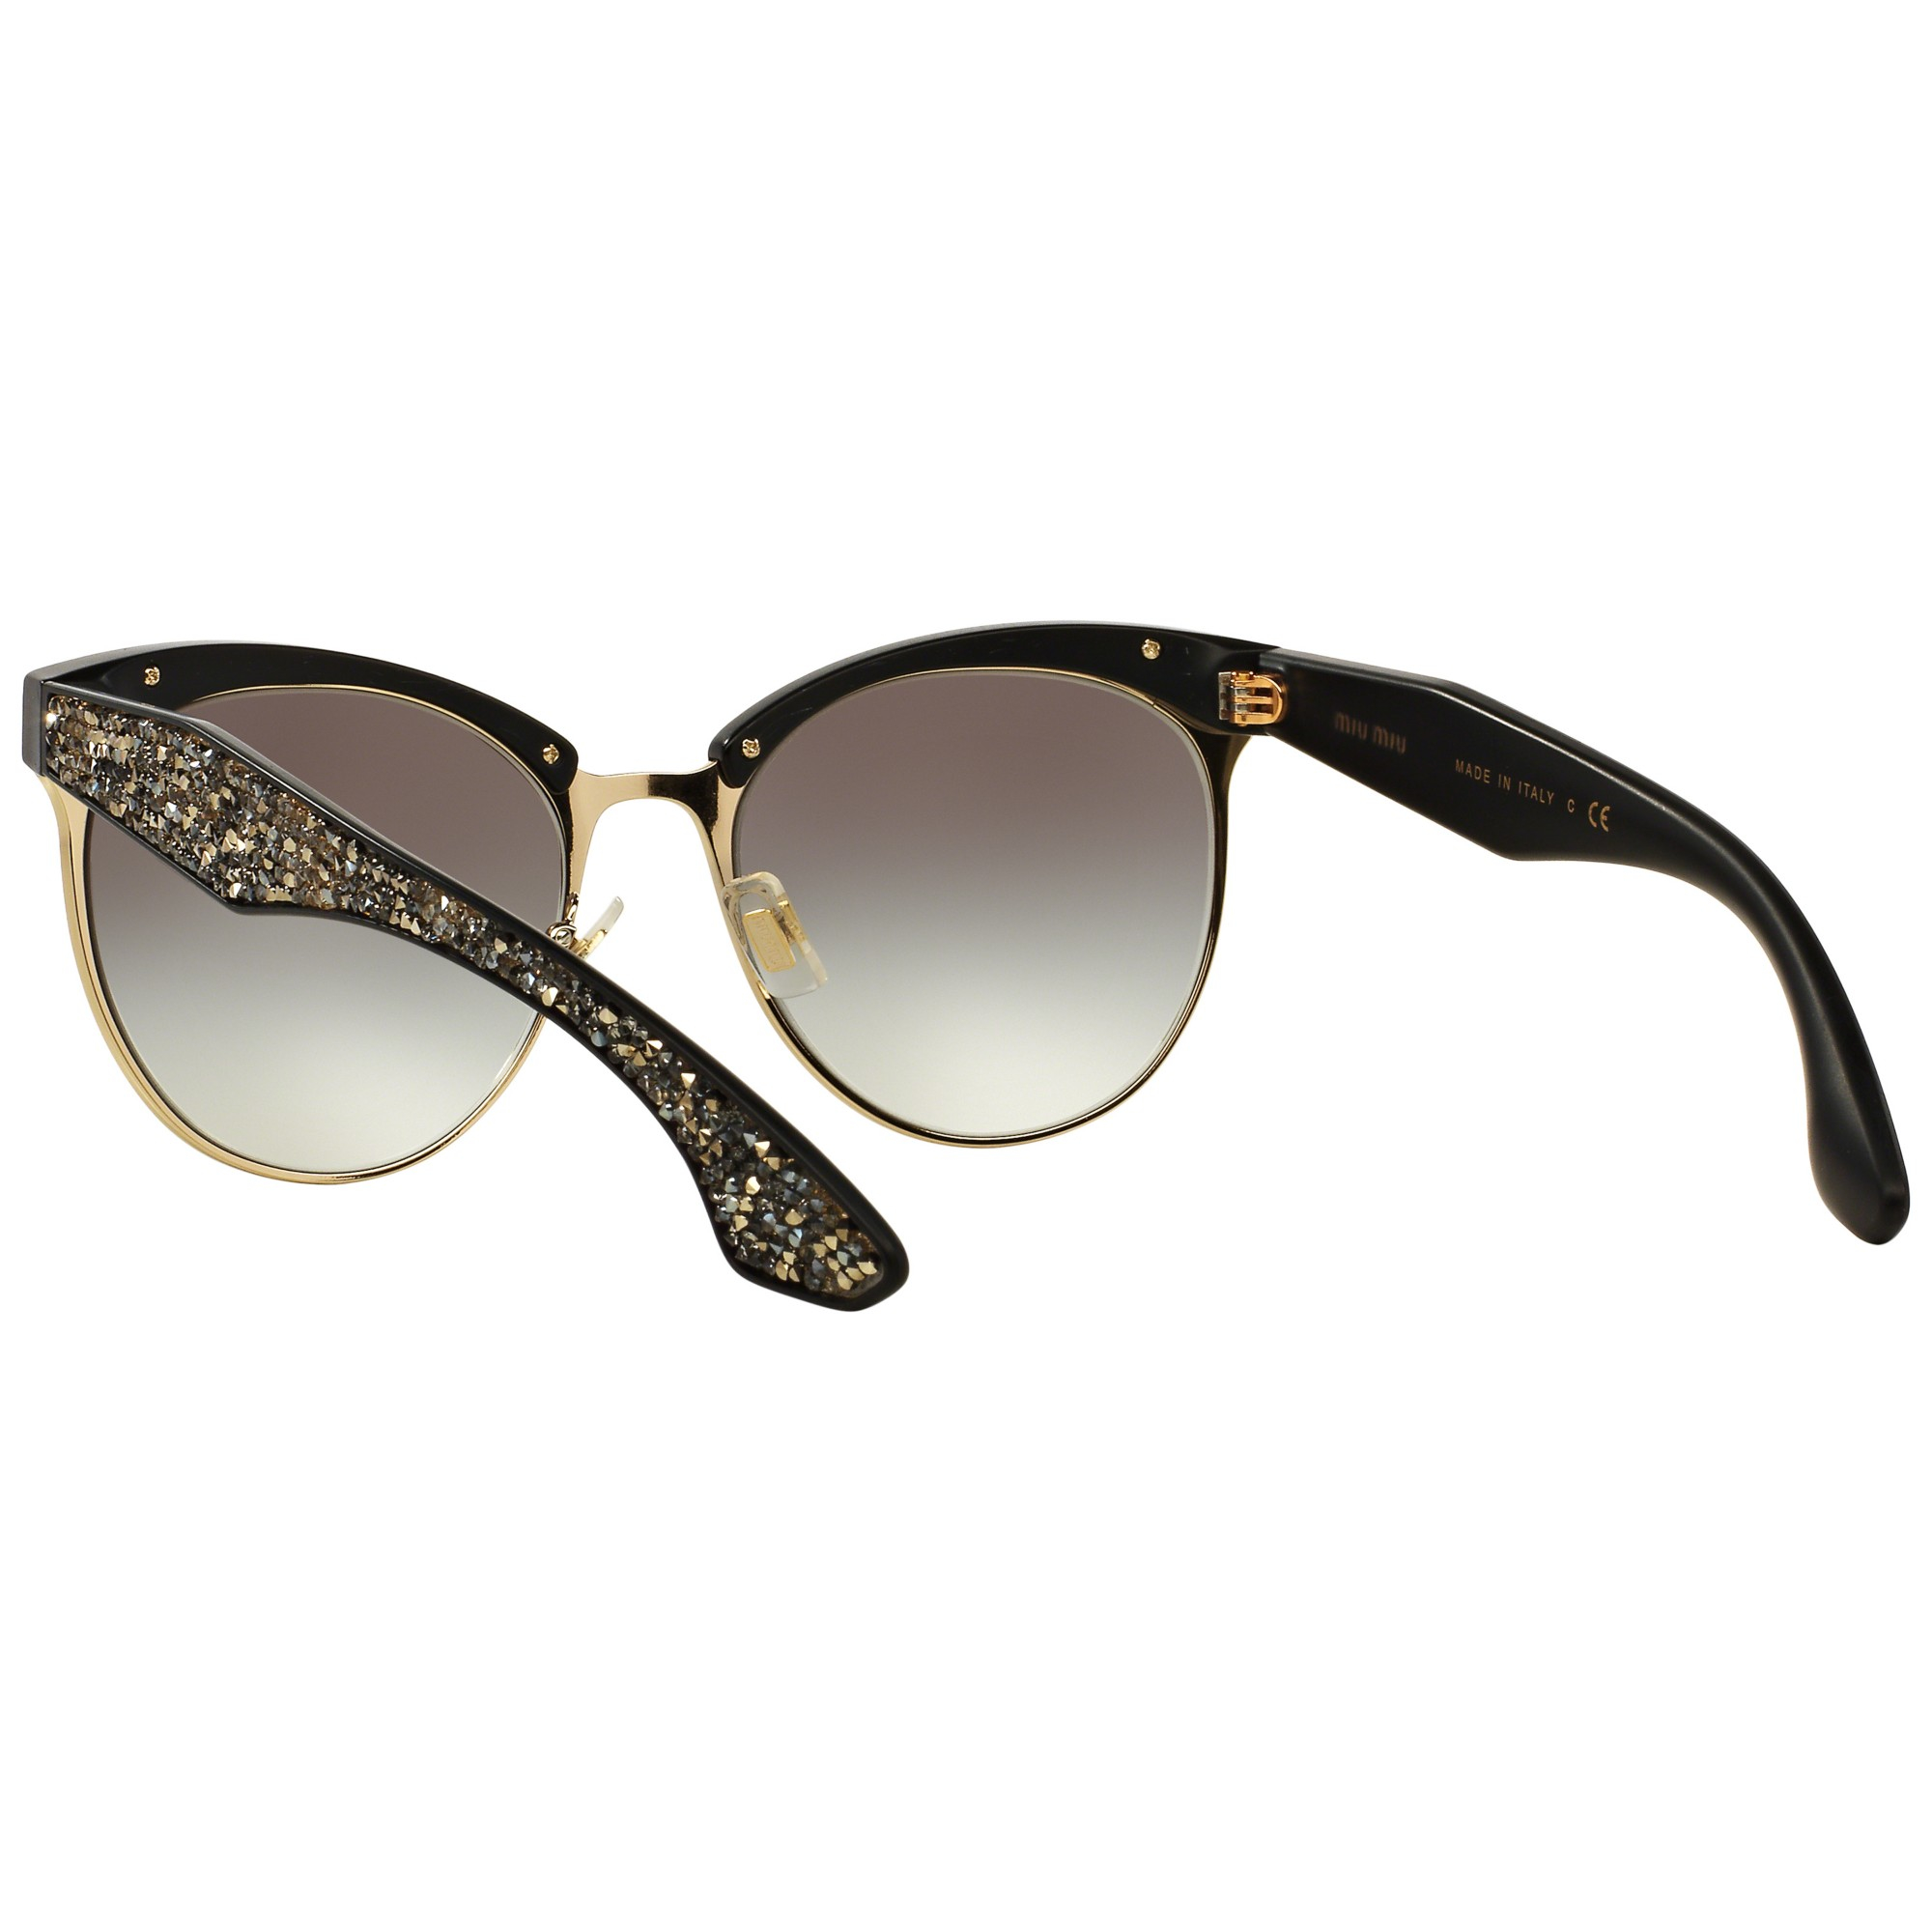 4c2f3ba801ae Miu Miu Mu54qs Stardust Bead Encrusted Sunglasses in Black - Lyst